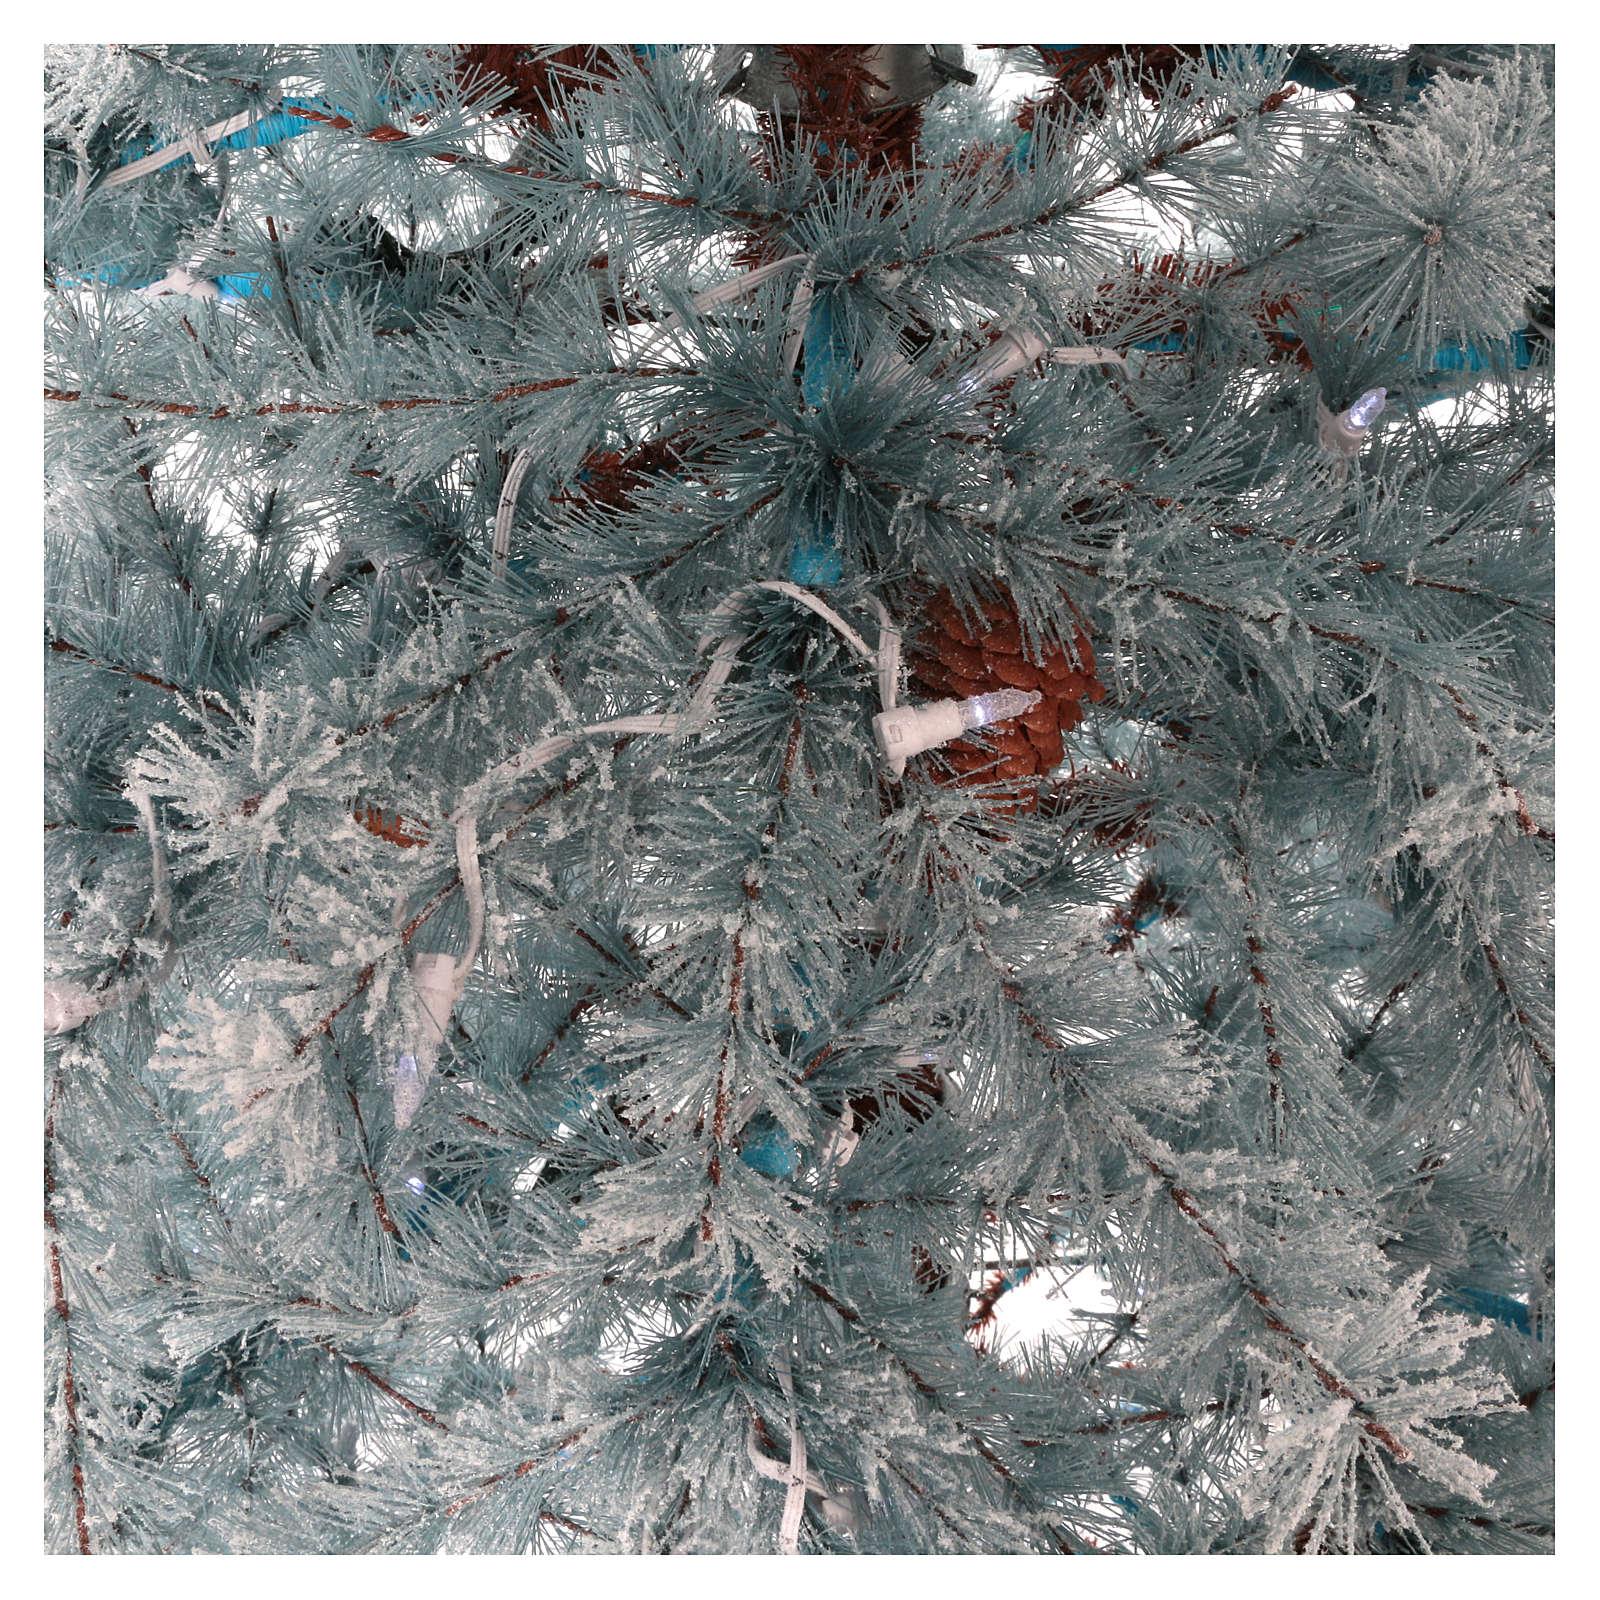 Arbol de Navidad 210 cm Victorian Blu escarcha piñas naturales 350 ECO LED para interior o exterior 3